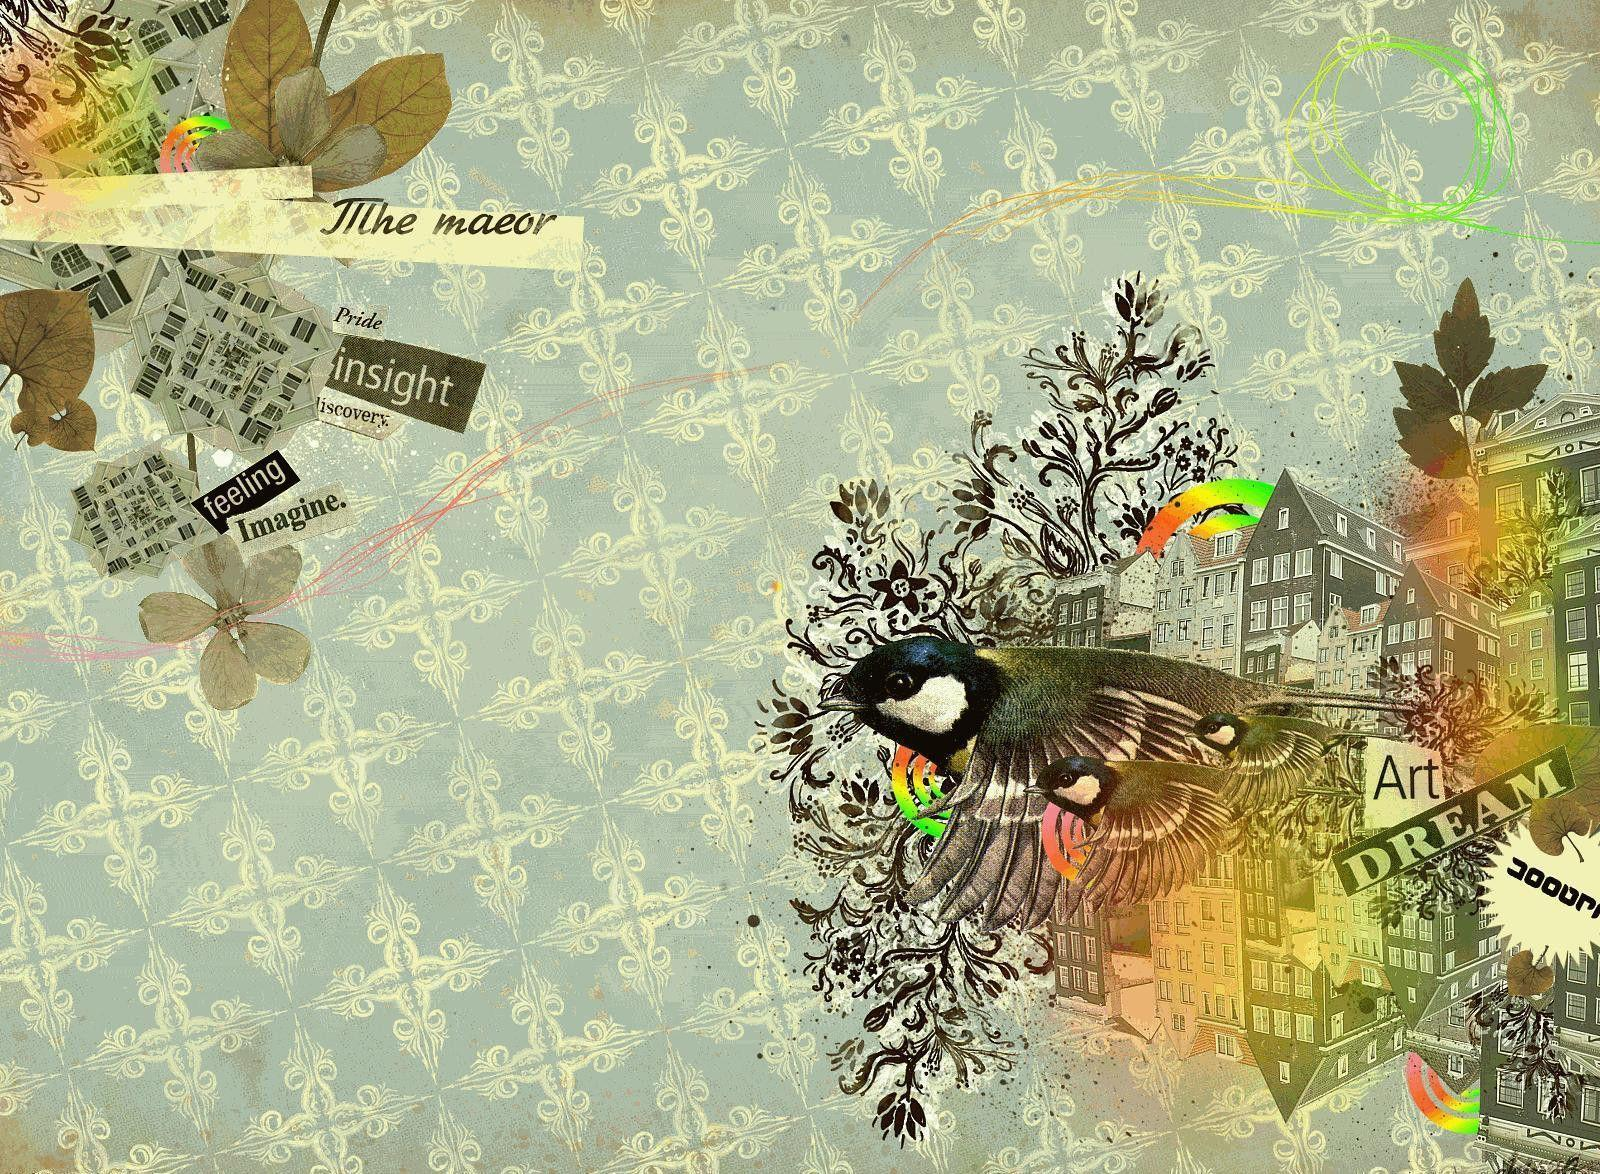 Retro Desktop Backgrounds - Wallpaper Cave